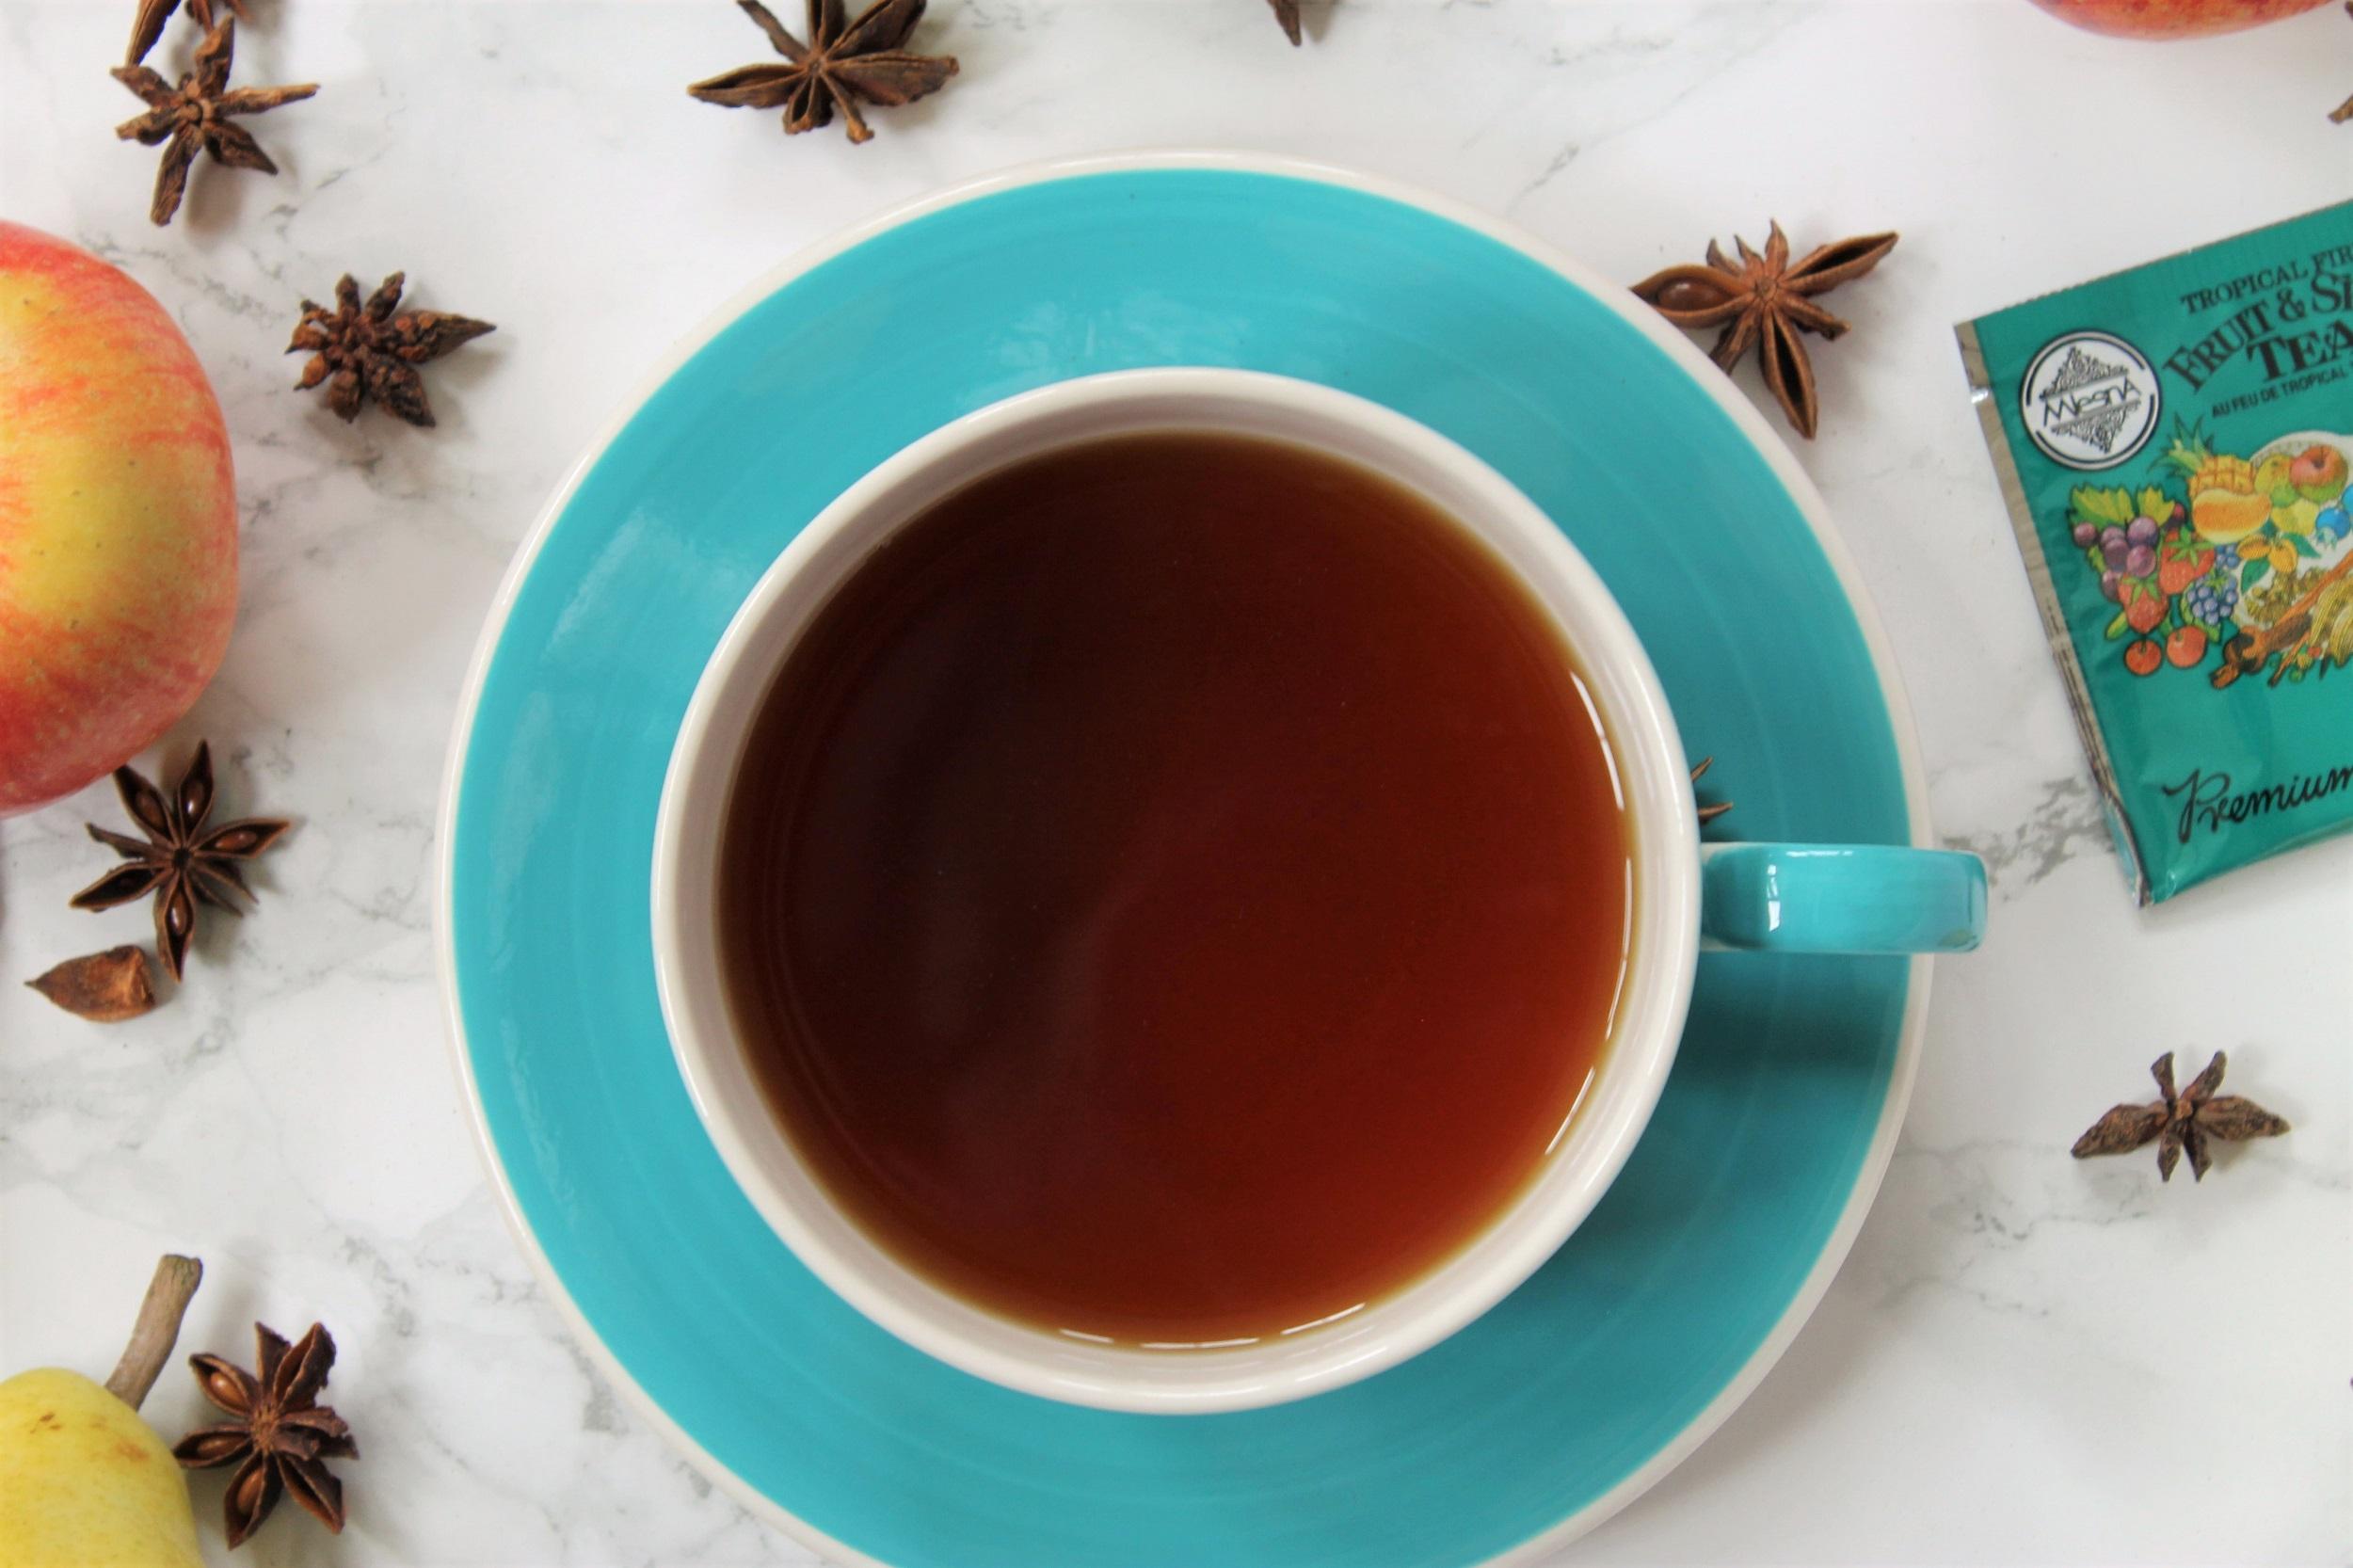 mlesna fruit and spice tea